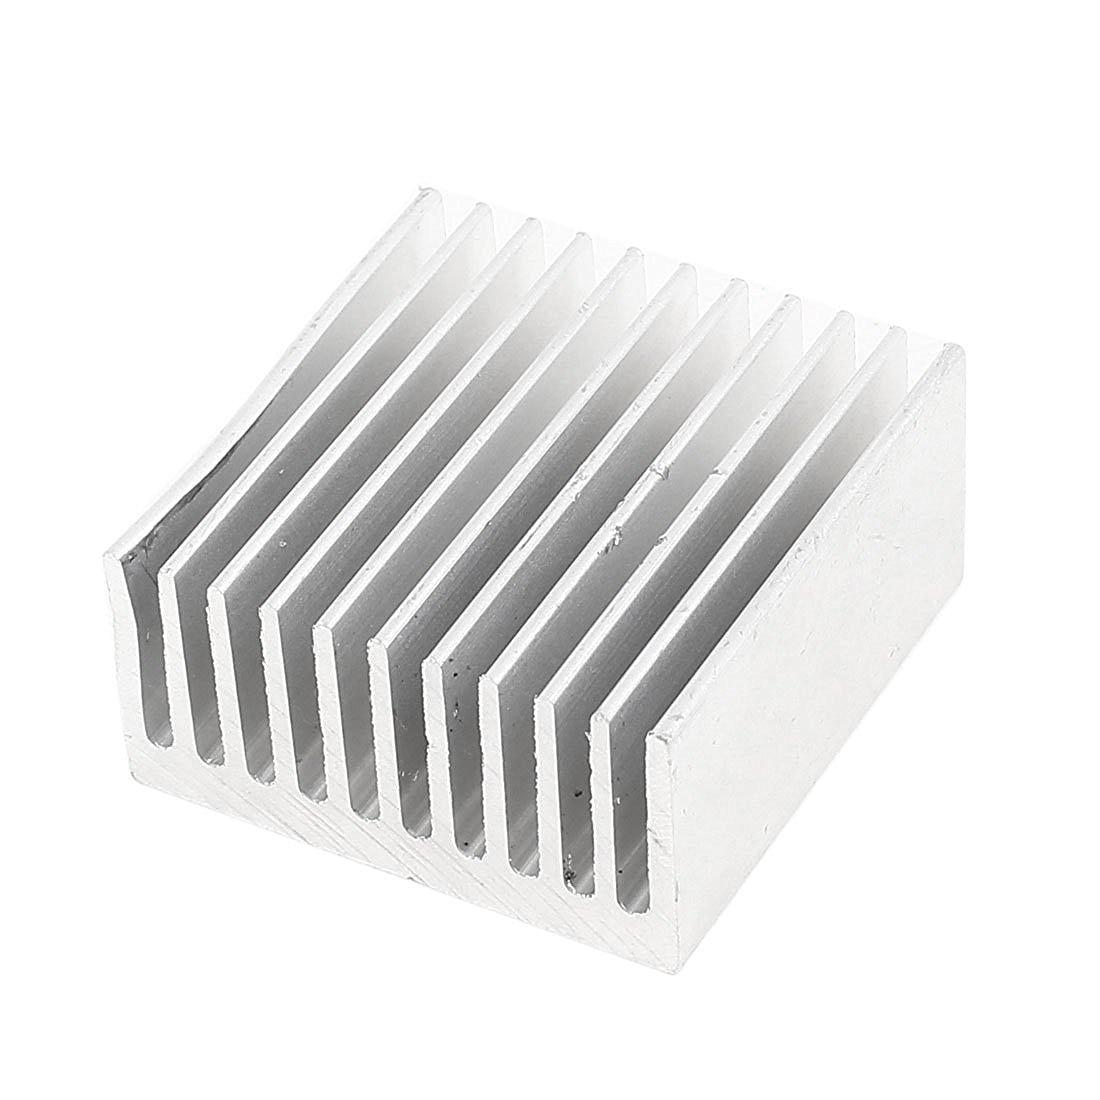 Silver Tone Aluminum Cooler Radiator Heat Sink Heatsink 40x40x20mm free ship 2pcs copper cooling heatsink instrument platform chip radiator 40 40 11mm heat sink radiator for electronics pcb board